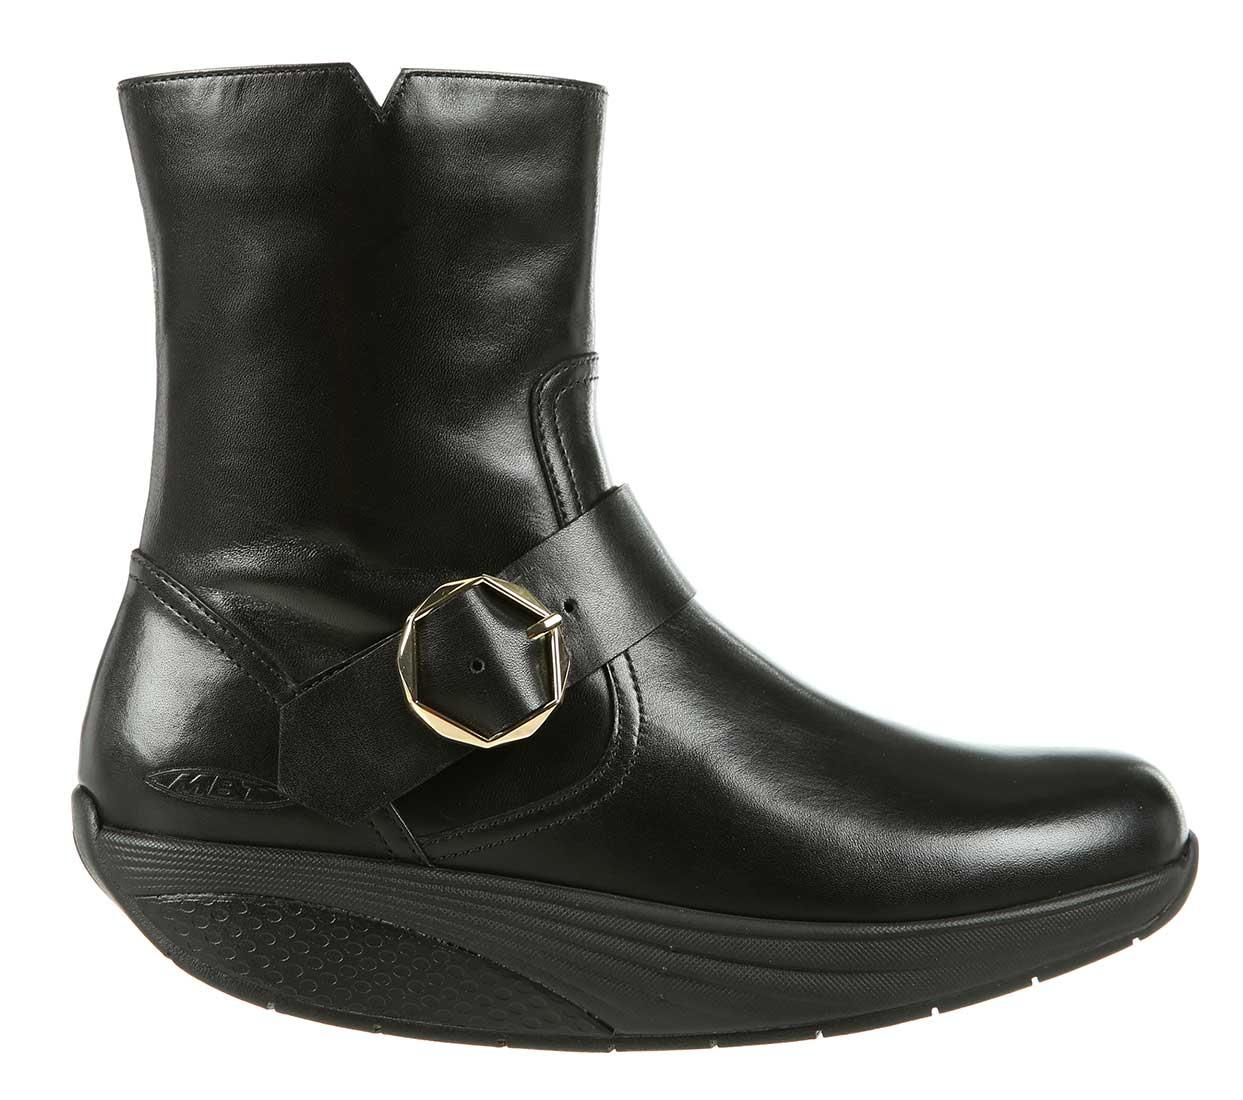 MBT Shoes Women\u0027s Magee Dress Mid Cut Boot , 700985